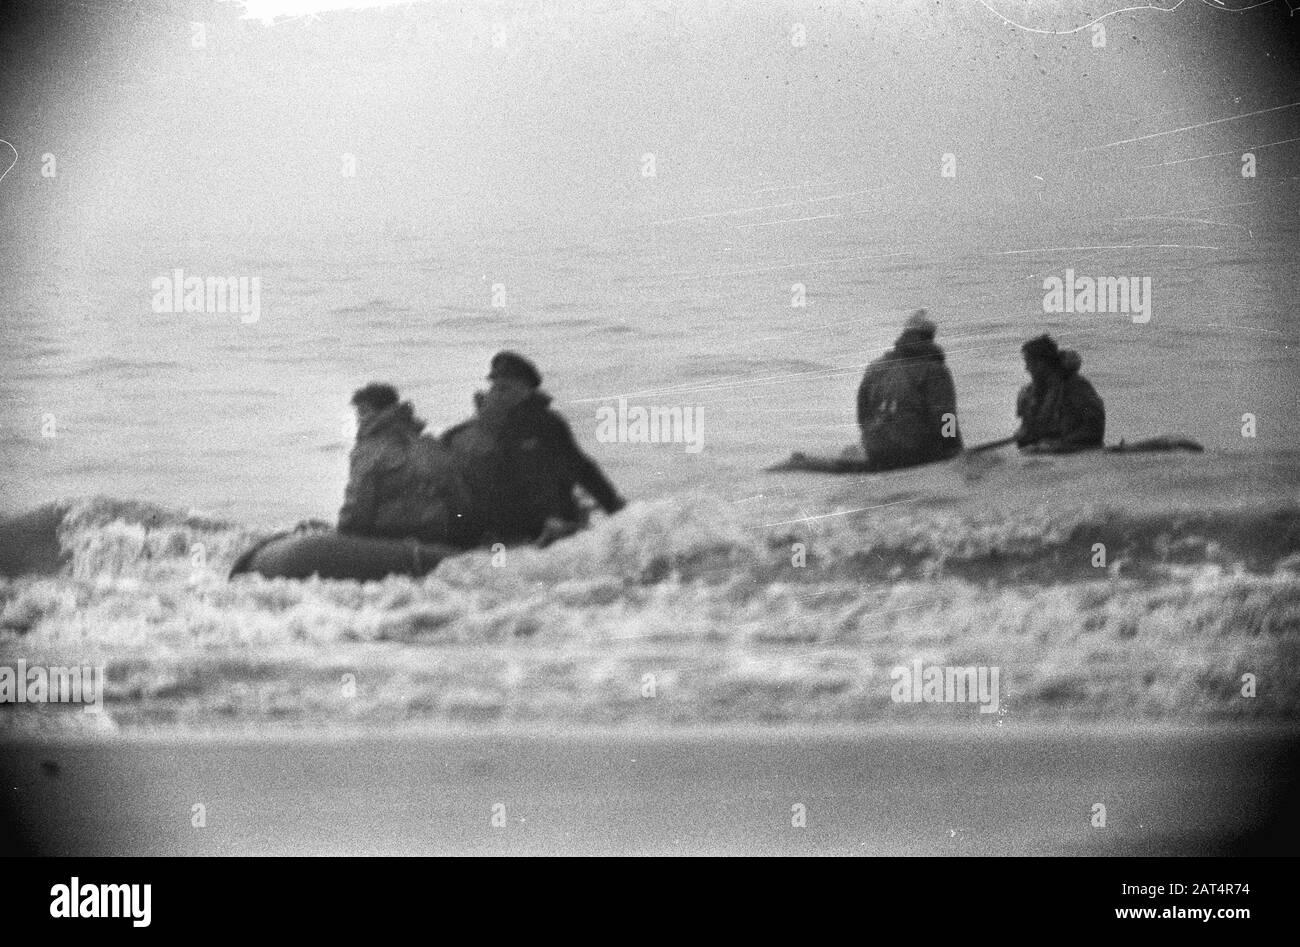 Joy flight 2 dead, the work at Katwijk Date: 23 January 1965 Location: Katwijk Keywords: storerooms, boats, seeen Stock Photo